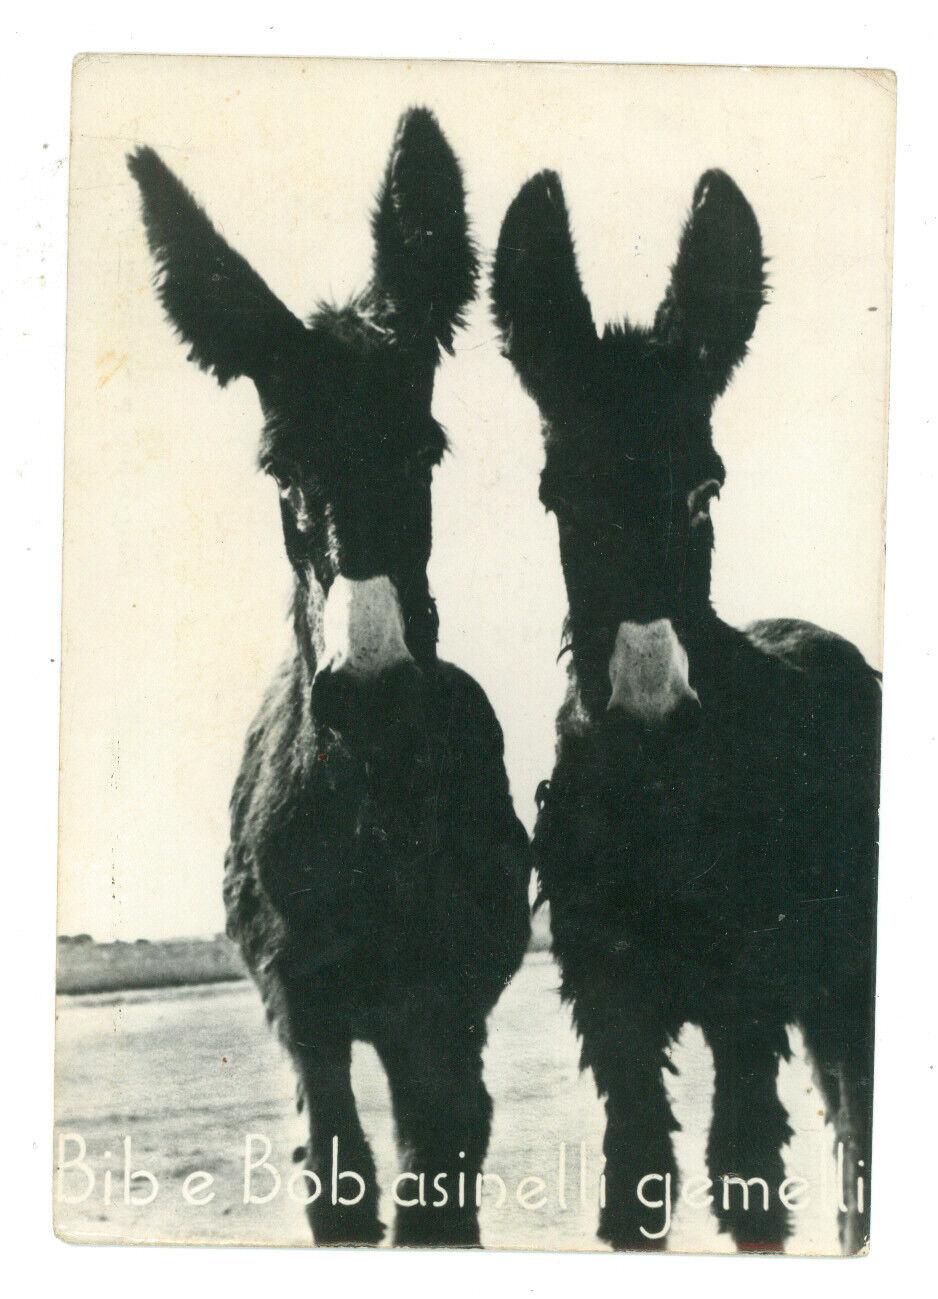 MARTINA FRANCA BIBE E BOB ASINELLI GEMELLI ESEMPLARI ASINI TARANTO PUGLIA 1960